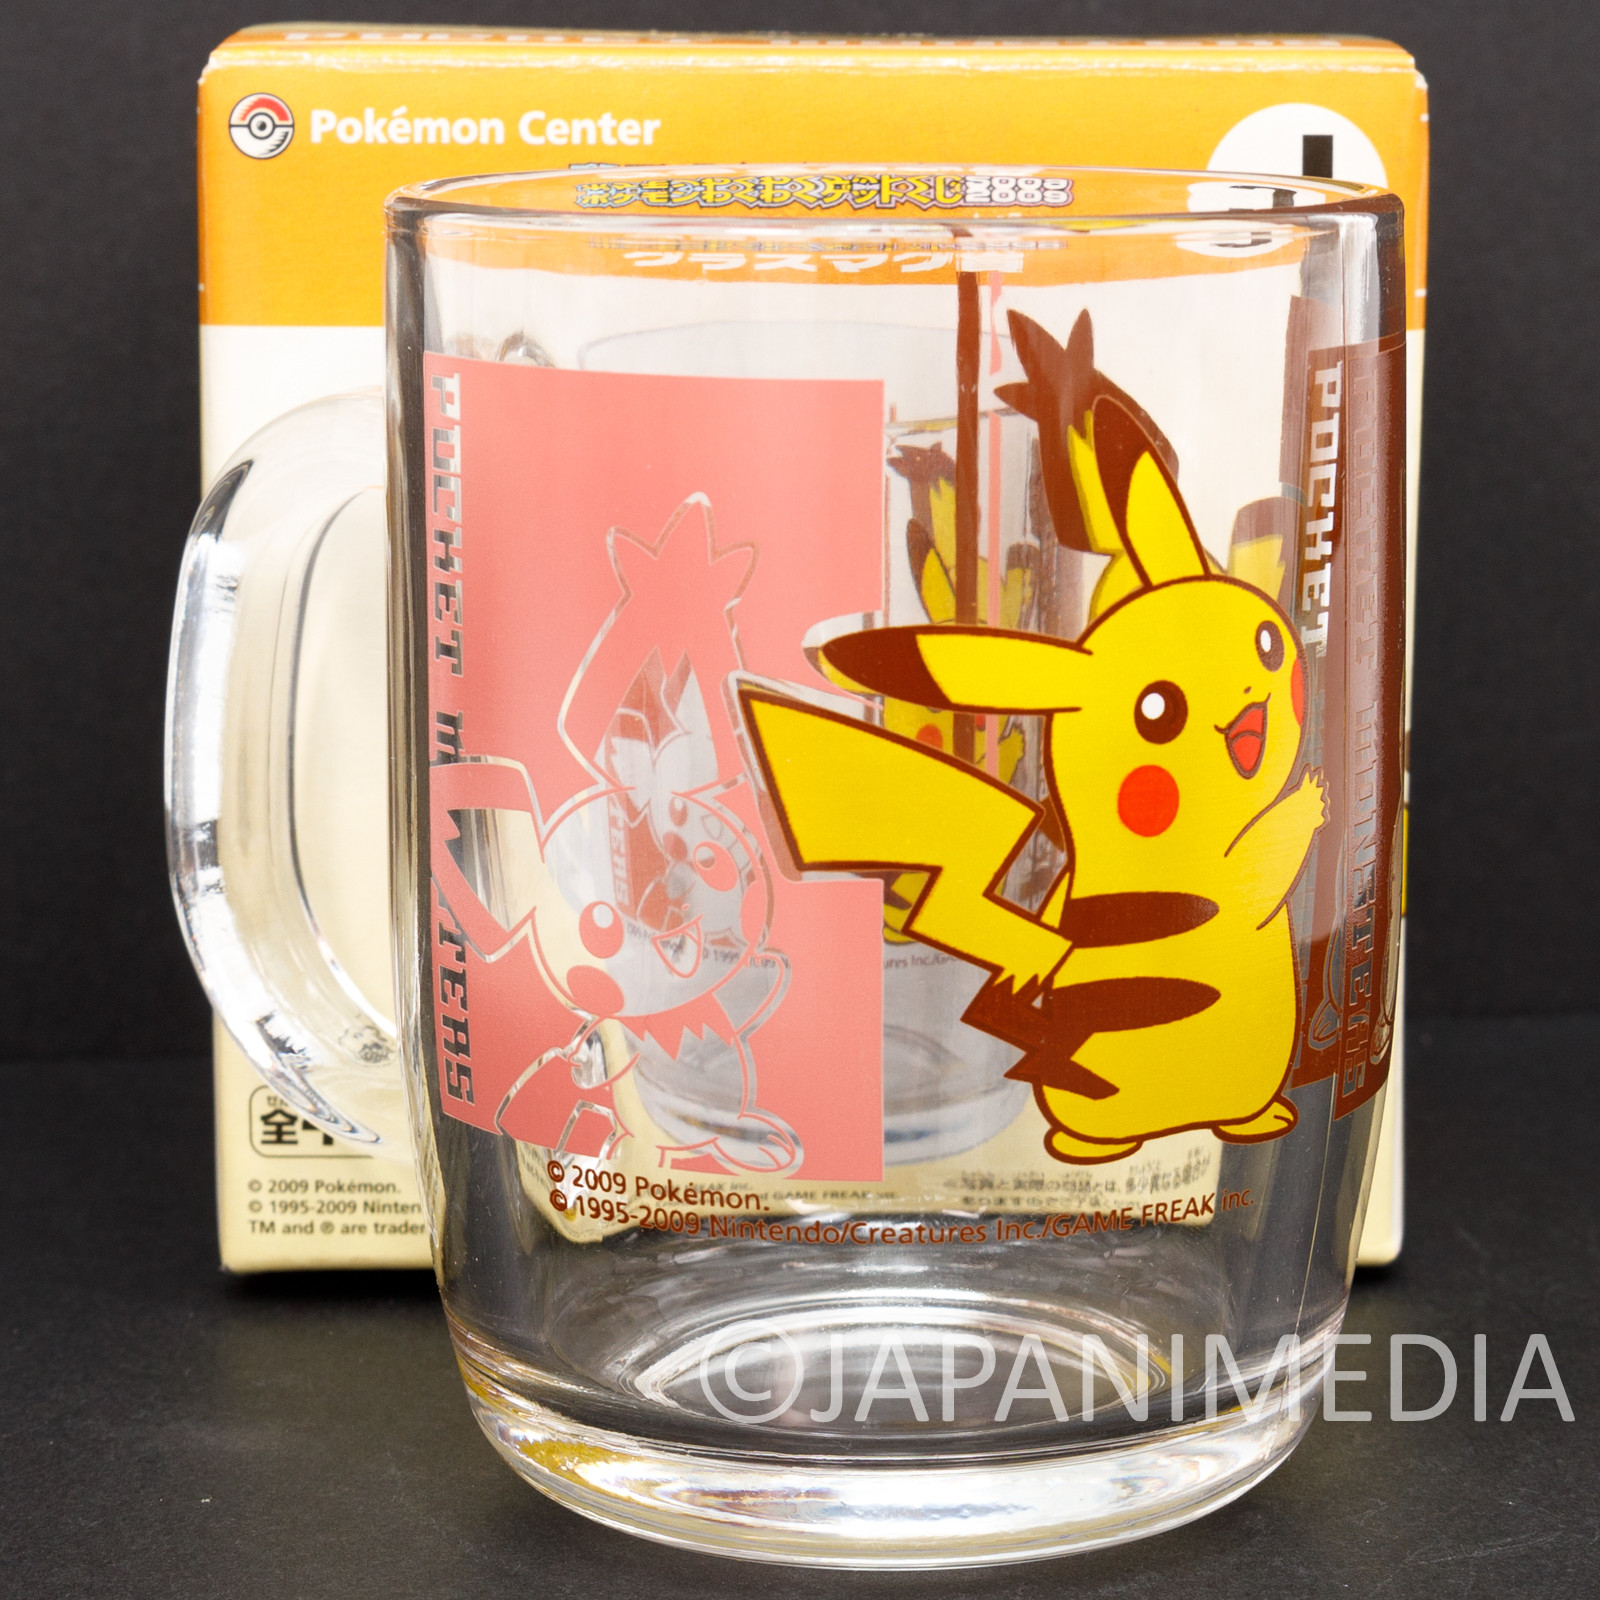 Pokemon Glass Mug Pikachu Banpresto Pocket Monsters Center JAPAN ANIME